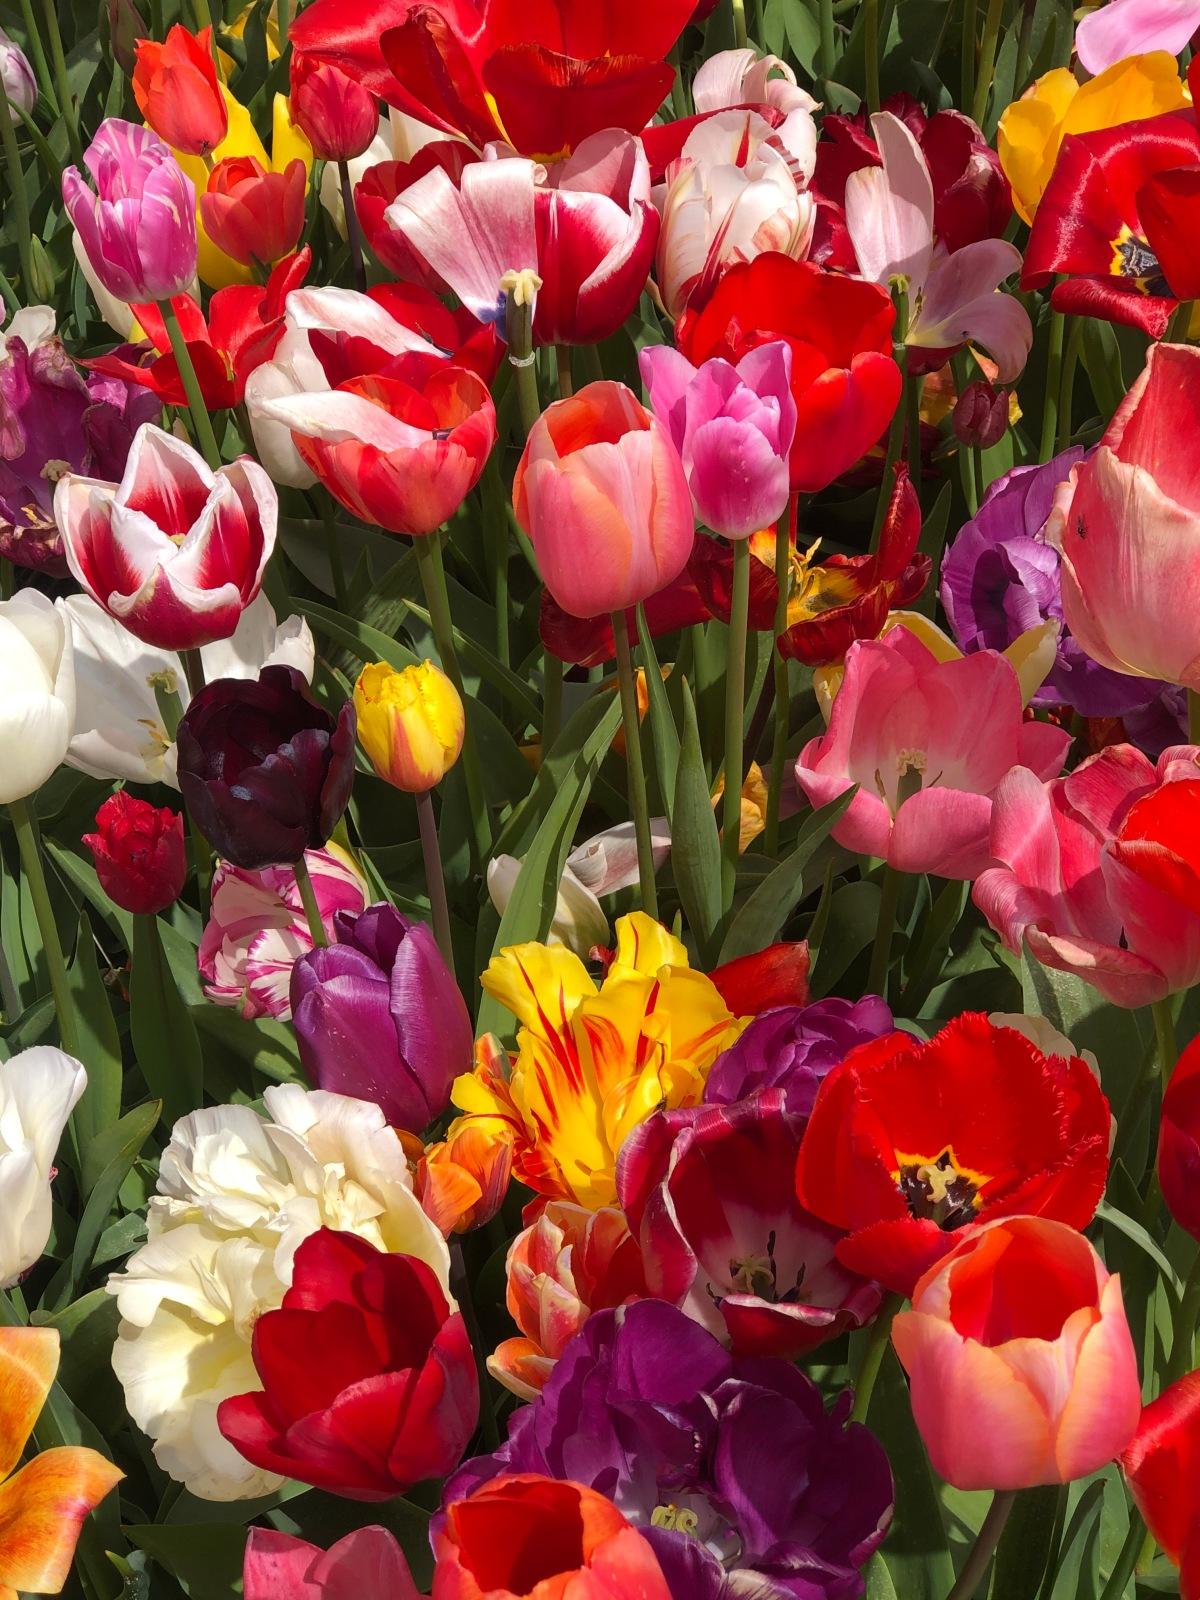 The Beautiful TulipBlog